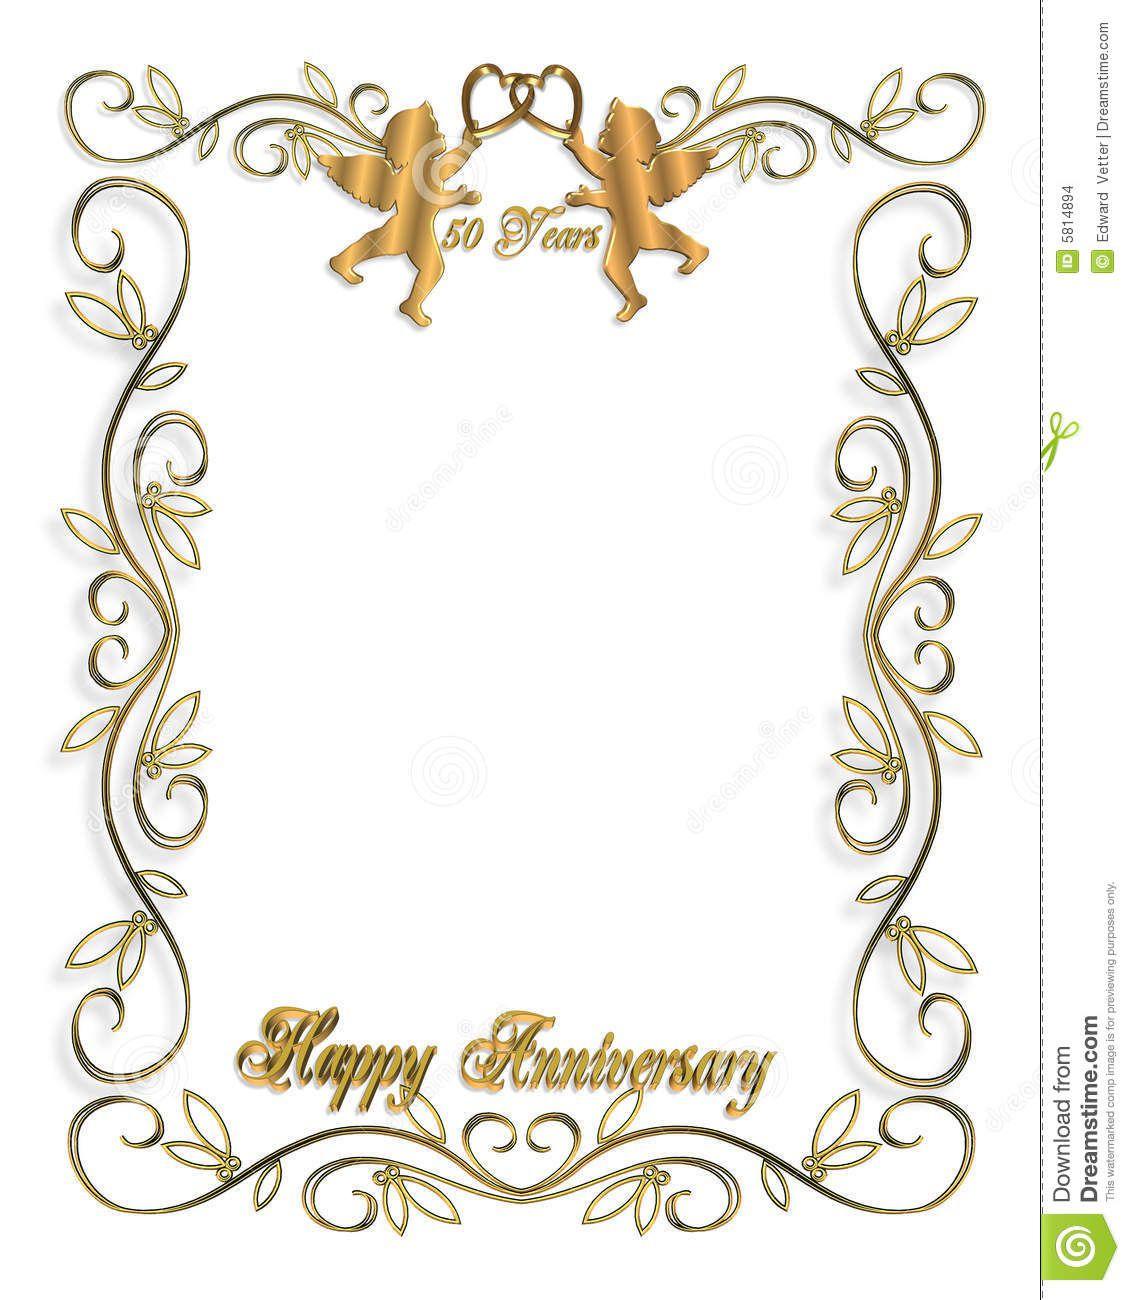 011 Imposing 50th Anniversary Party Invitation Template Design  Templates Golden Wedding Uk Microsoft Word FreeFull